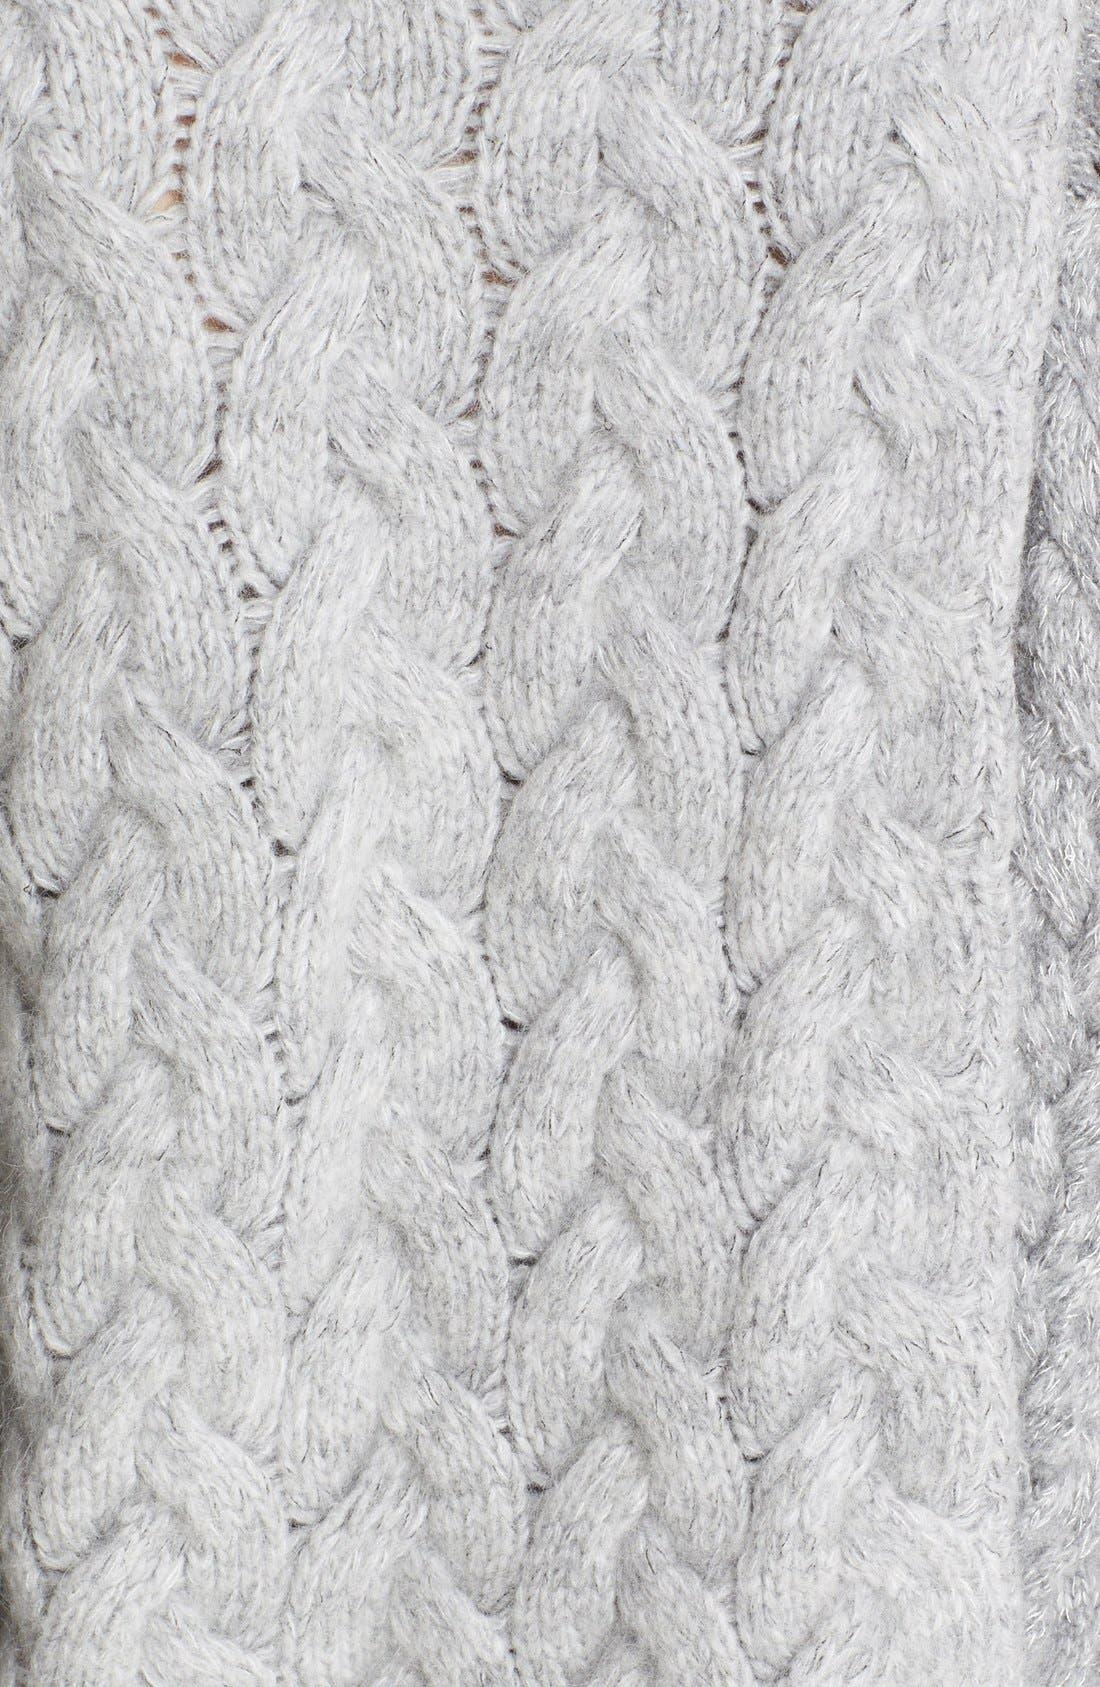 STELLA MCCARTNEY, Mixed Media Turtleneck Sweater, Alternate thumbnail 5, color, 120